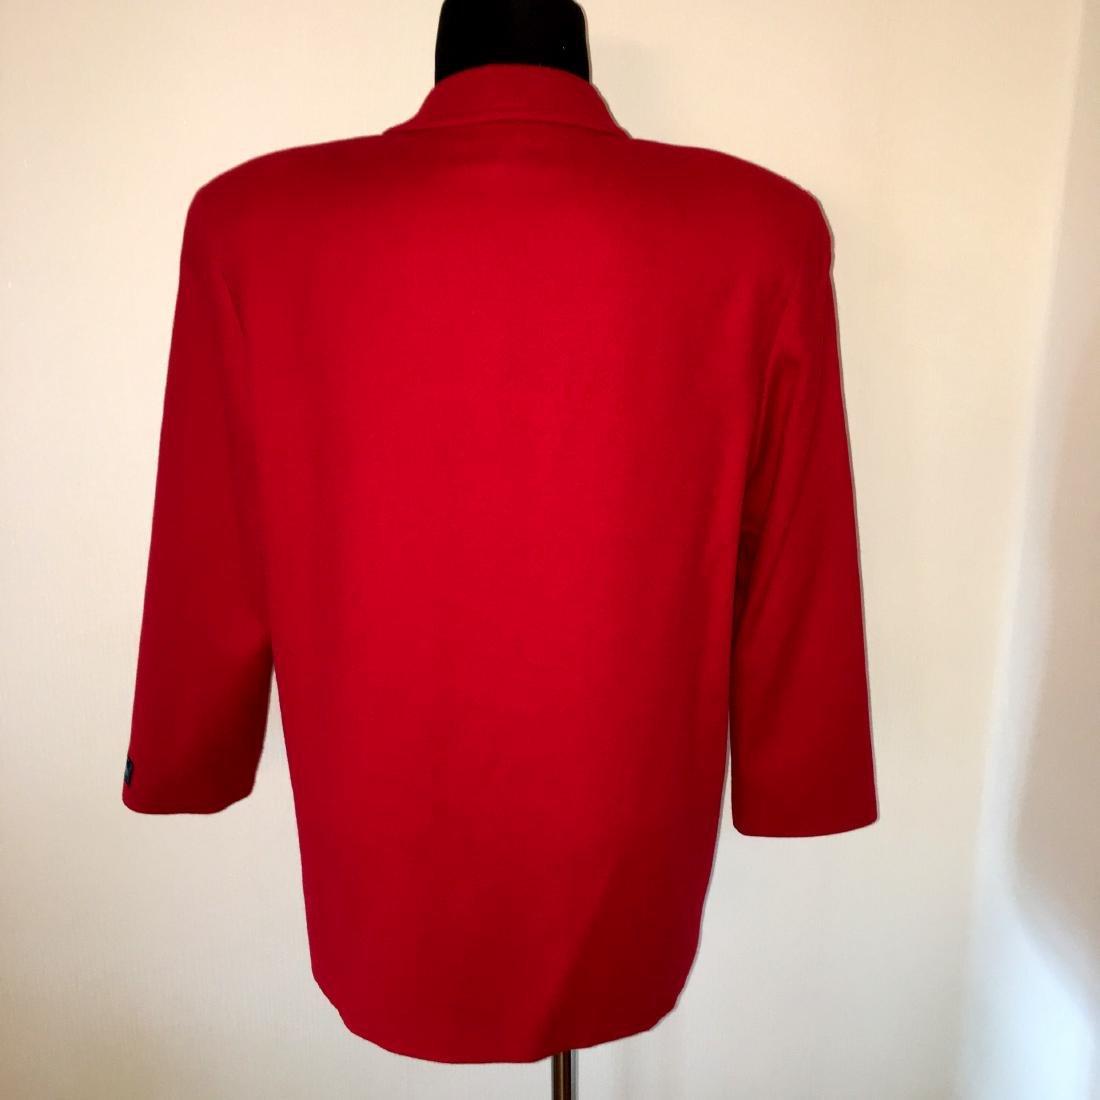 Women's Burberry Vintage 100% Wool Red Jacket Blazer - 6